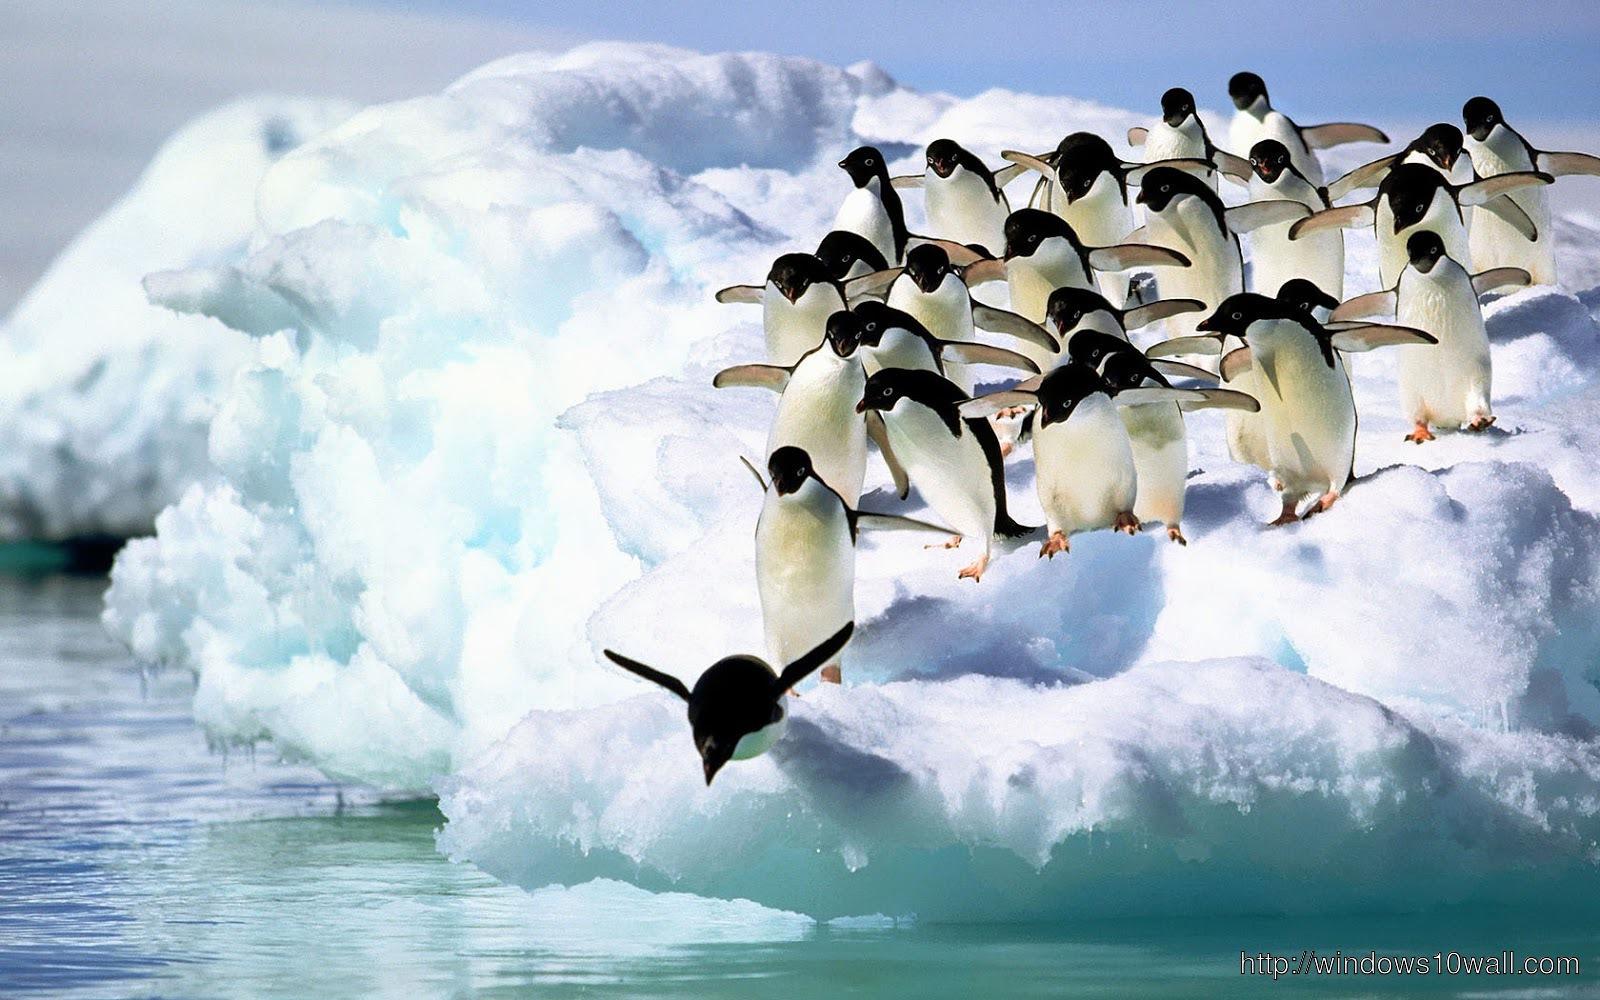 pittsburgh penguins iphone 4 wallpaper